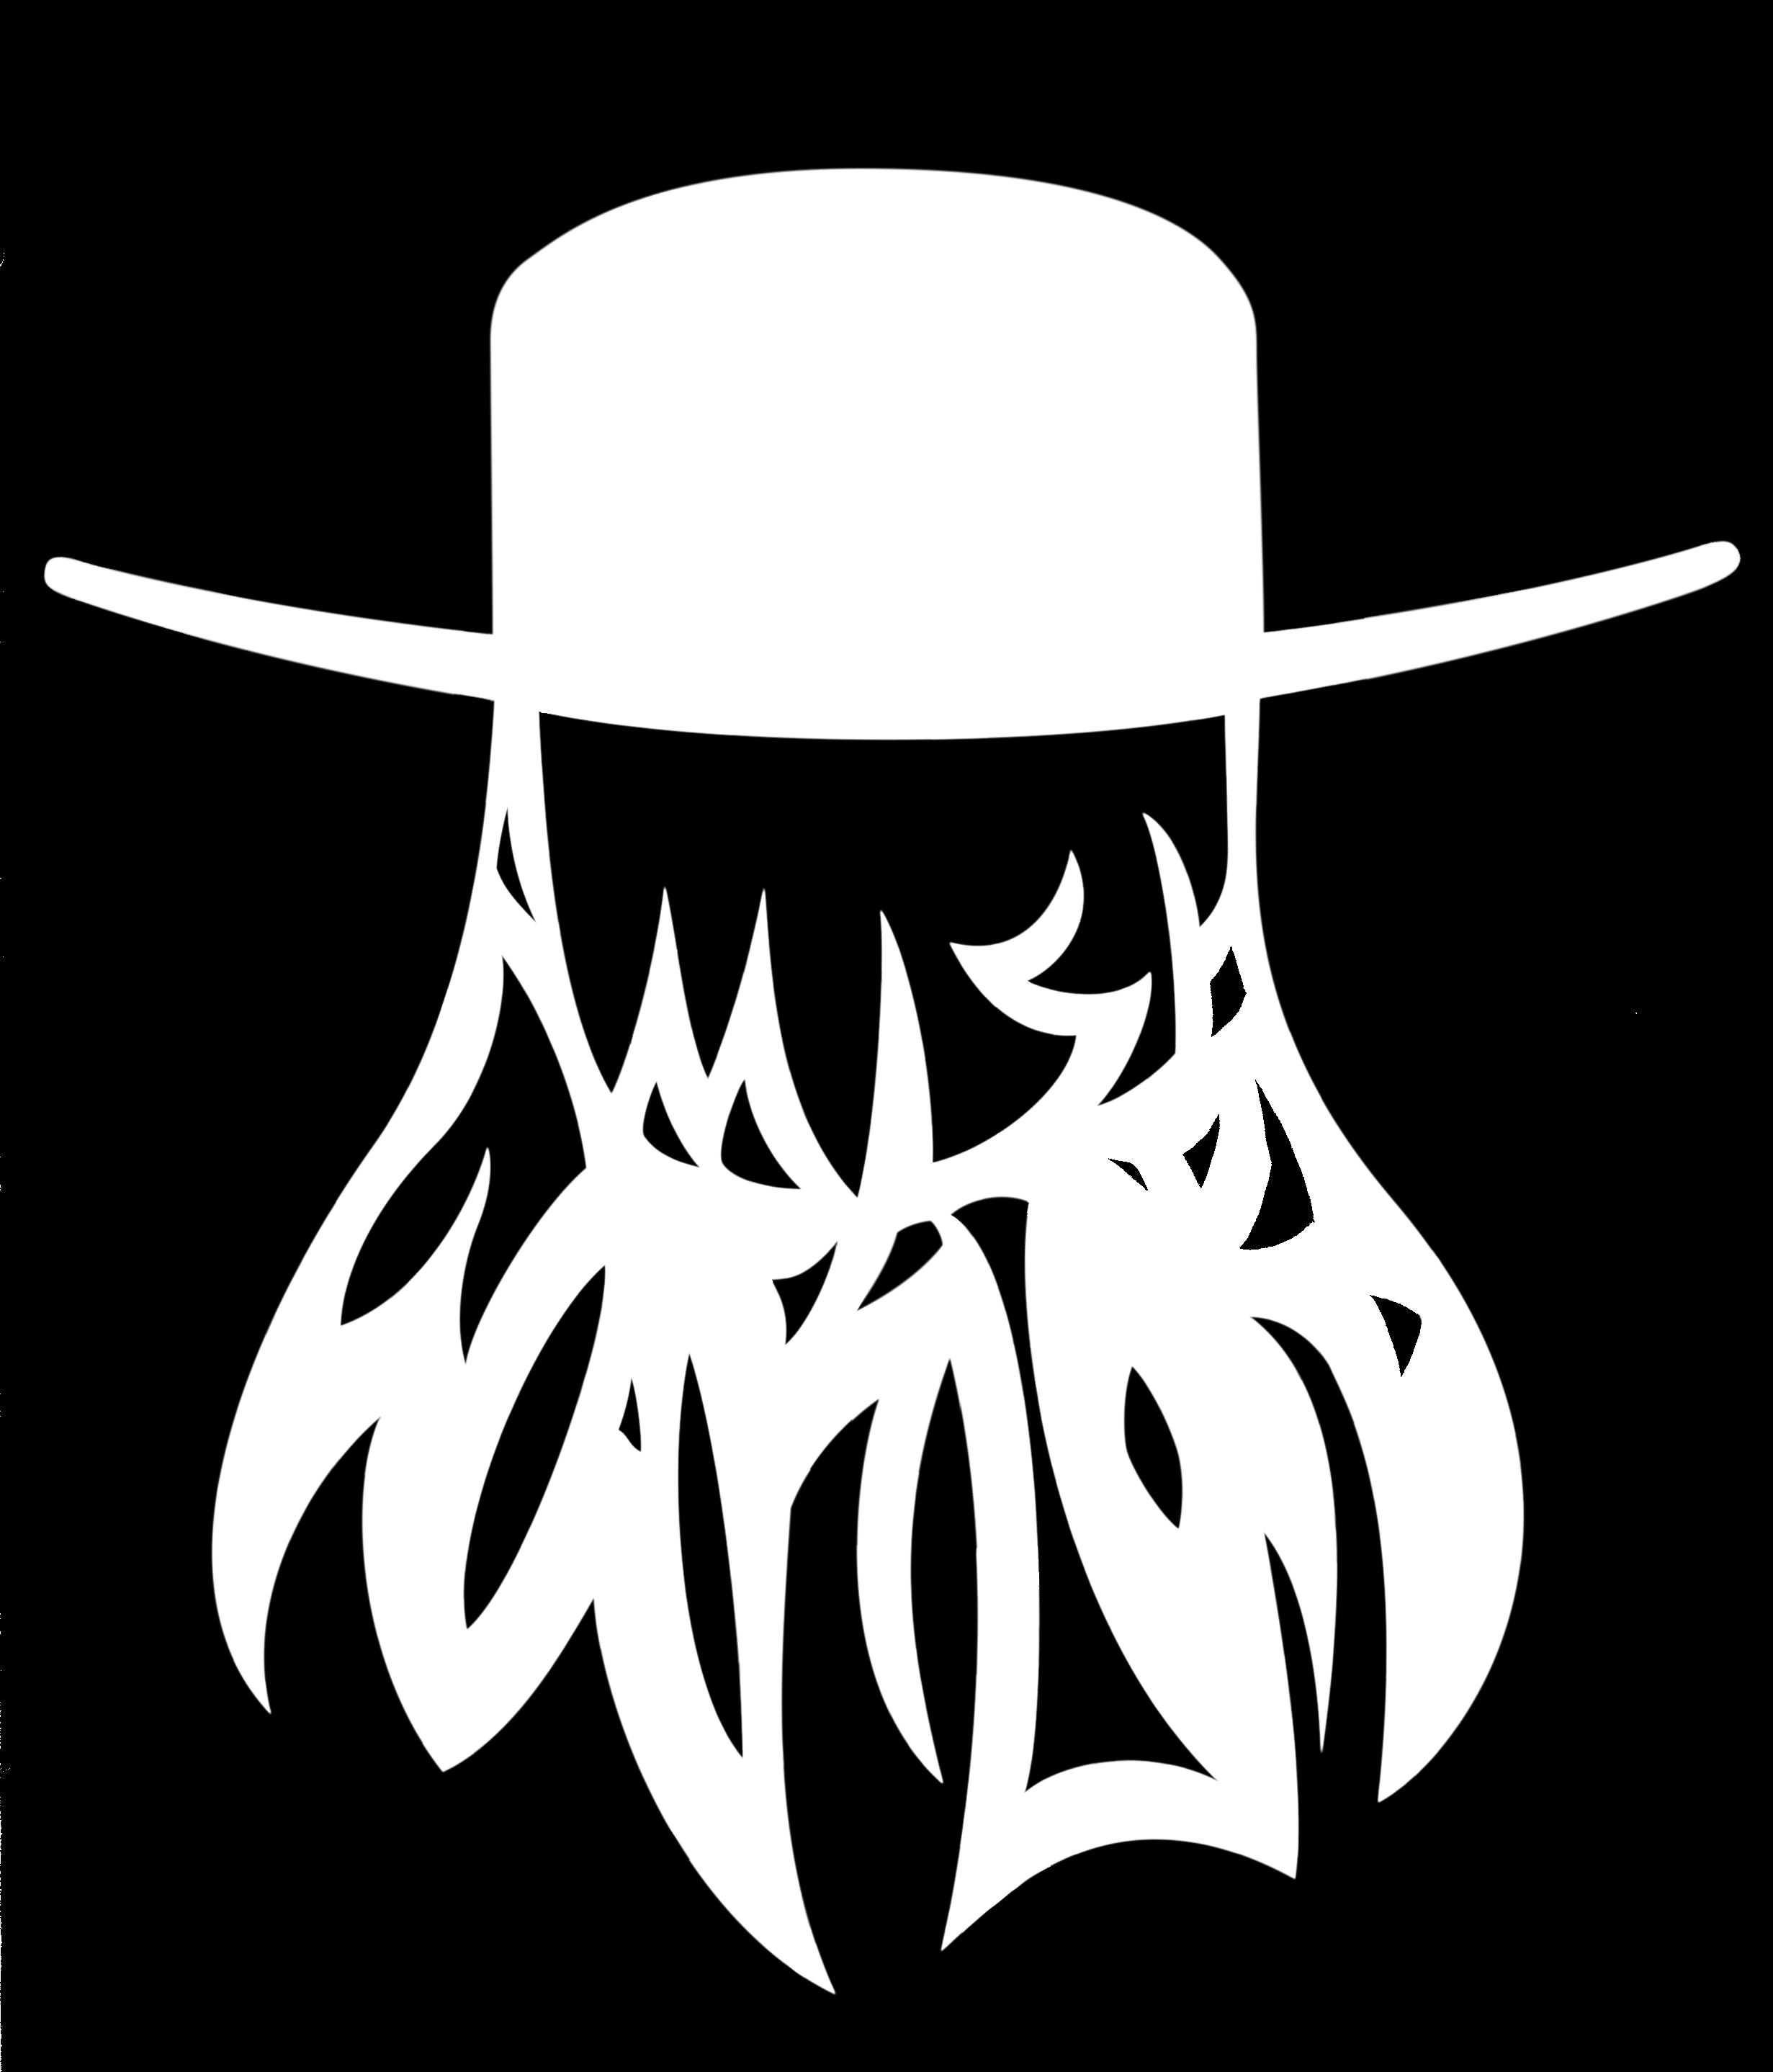 Logo for the sludge metal band Amish Warlord.